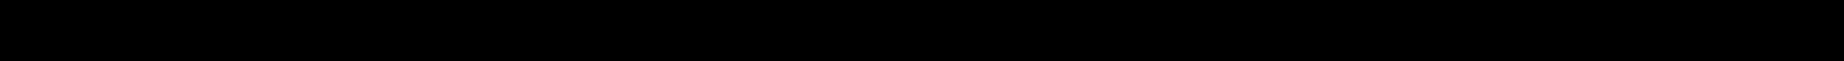 Clockwise from top right: Custom Dining Table, Liam Montano. Soft Edge 12 Side Chairs, Hay; Brass X4 Pendant Lamp, Allied Maker; Ceramic Tumblers, Zakka Bakka; Cake Sculpture, Will Cotton; Mini Orb Sconces, Allied Maker; Range, Monogram; Quartz Countertops in Blizzard, Caesar Stone; Custom Cabinetry with Cabinet Edge Pull, Emtek.